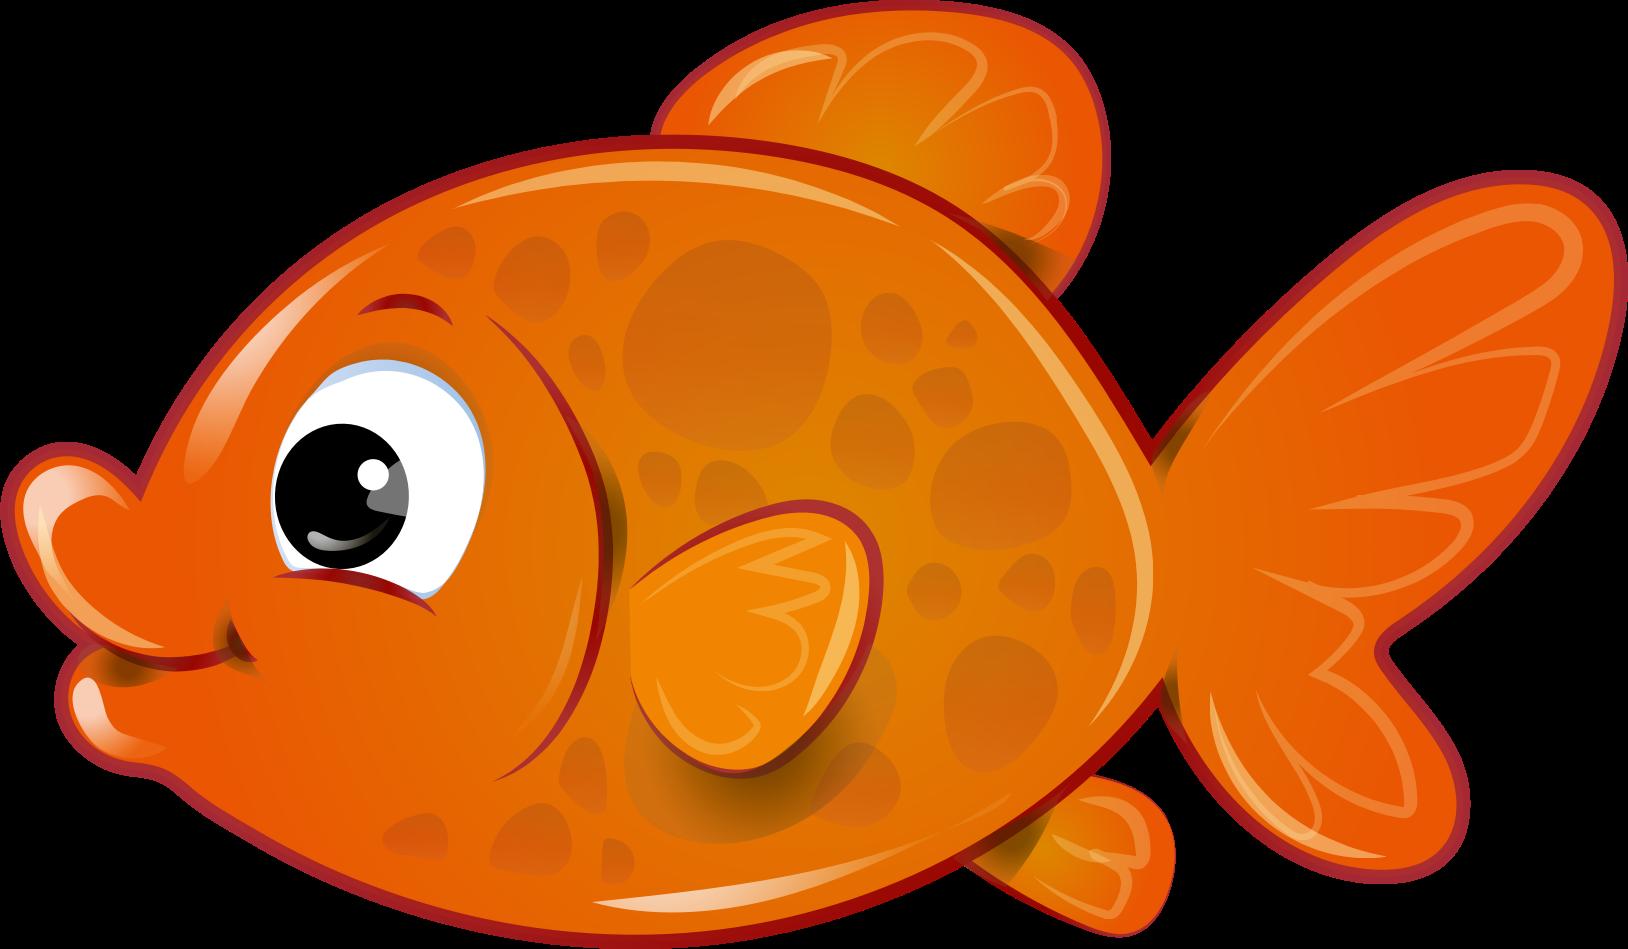 Goldfish clipart 4 fish. Big image png